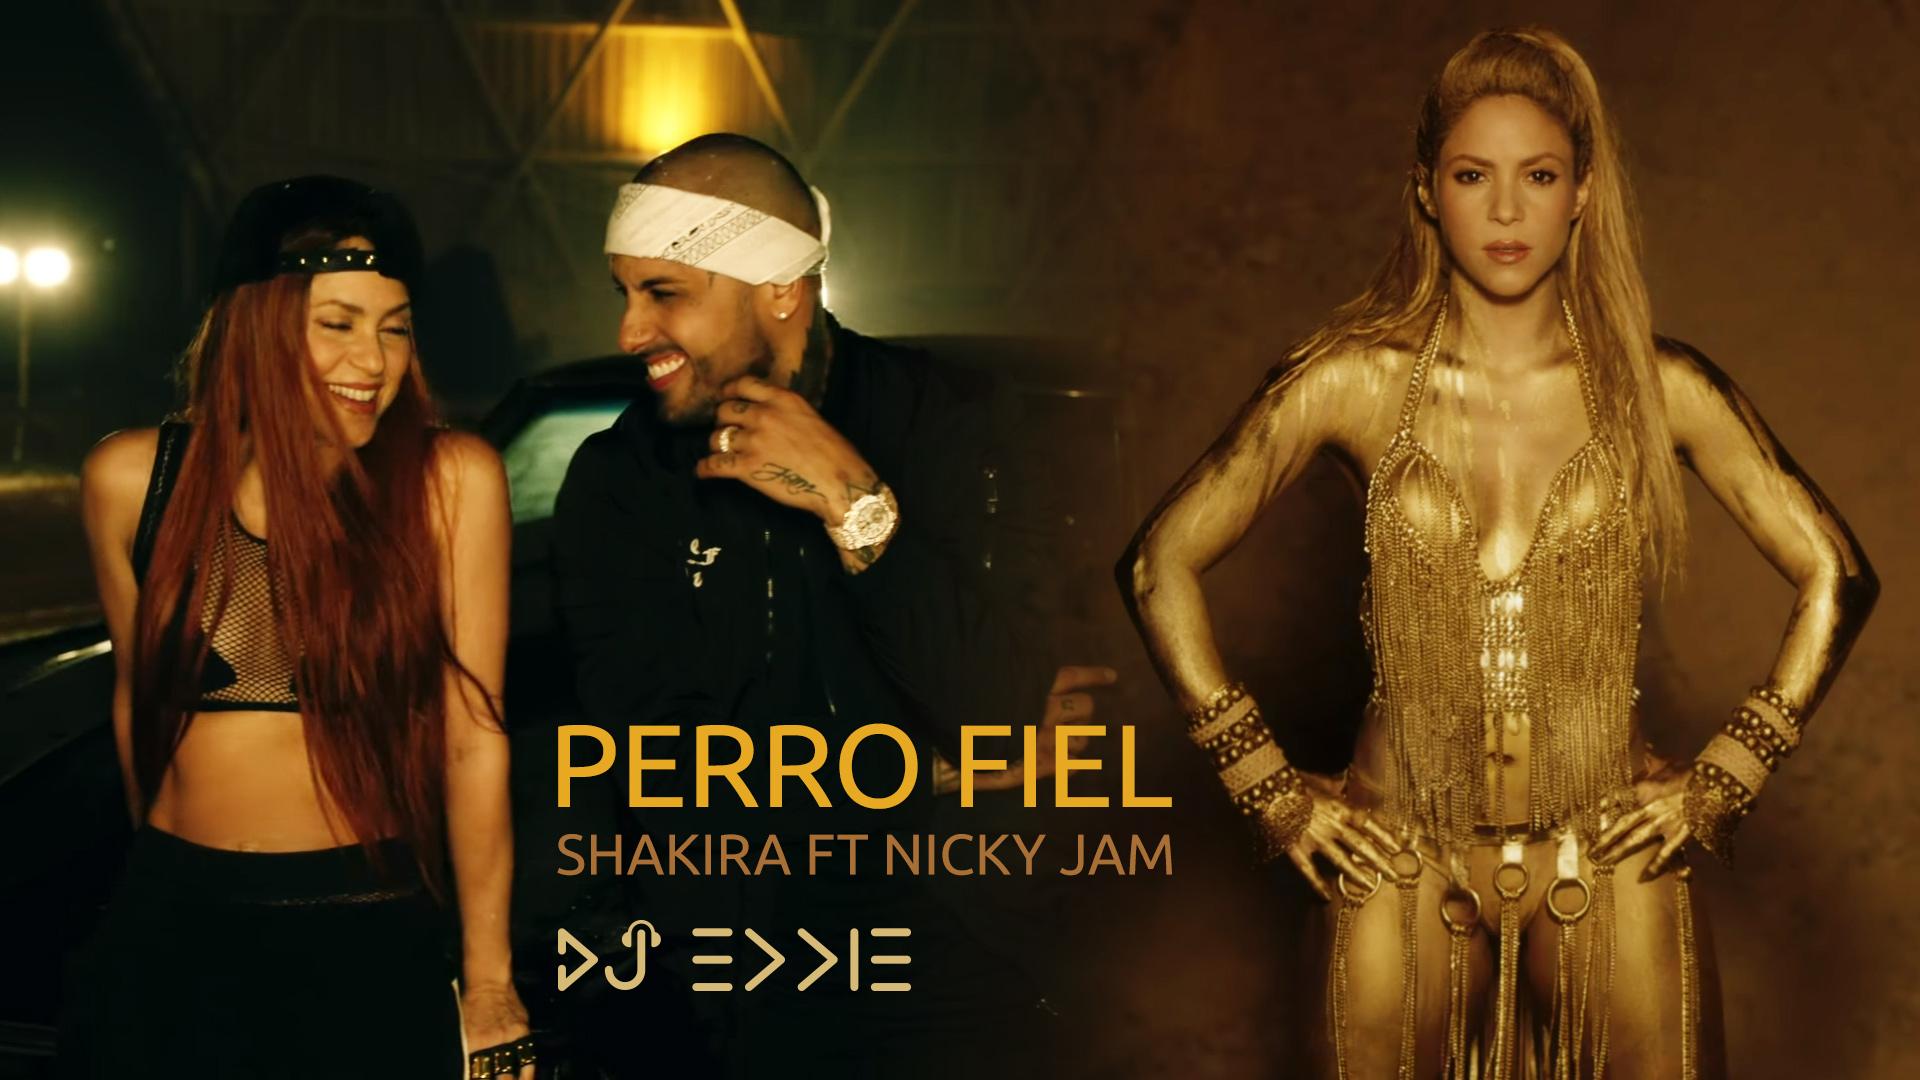 Shakira ft Nicky Jam - Perro Fiel